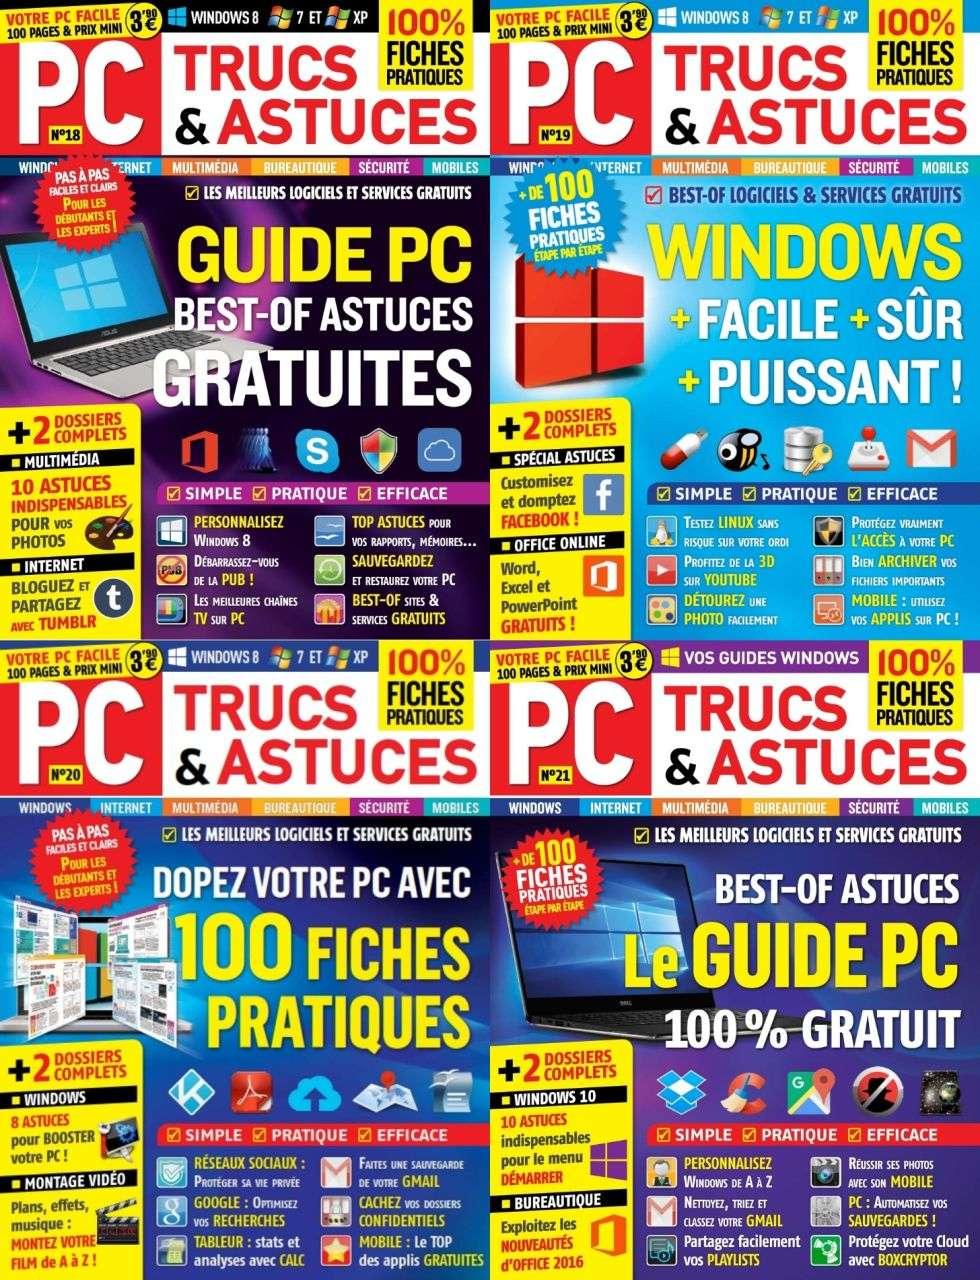 PC Trucs & Astuces - Collection Annuelle 2015